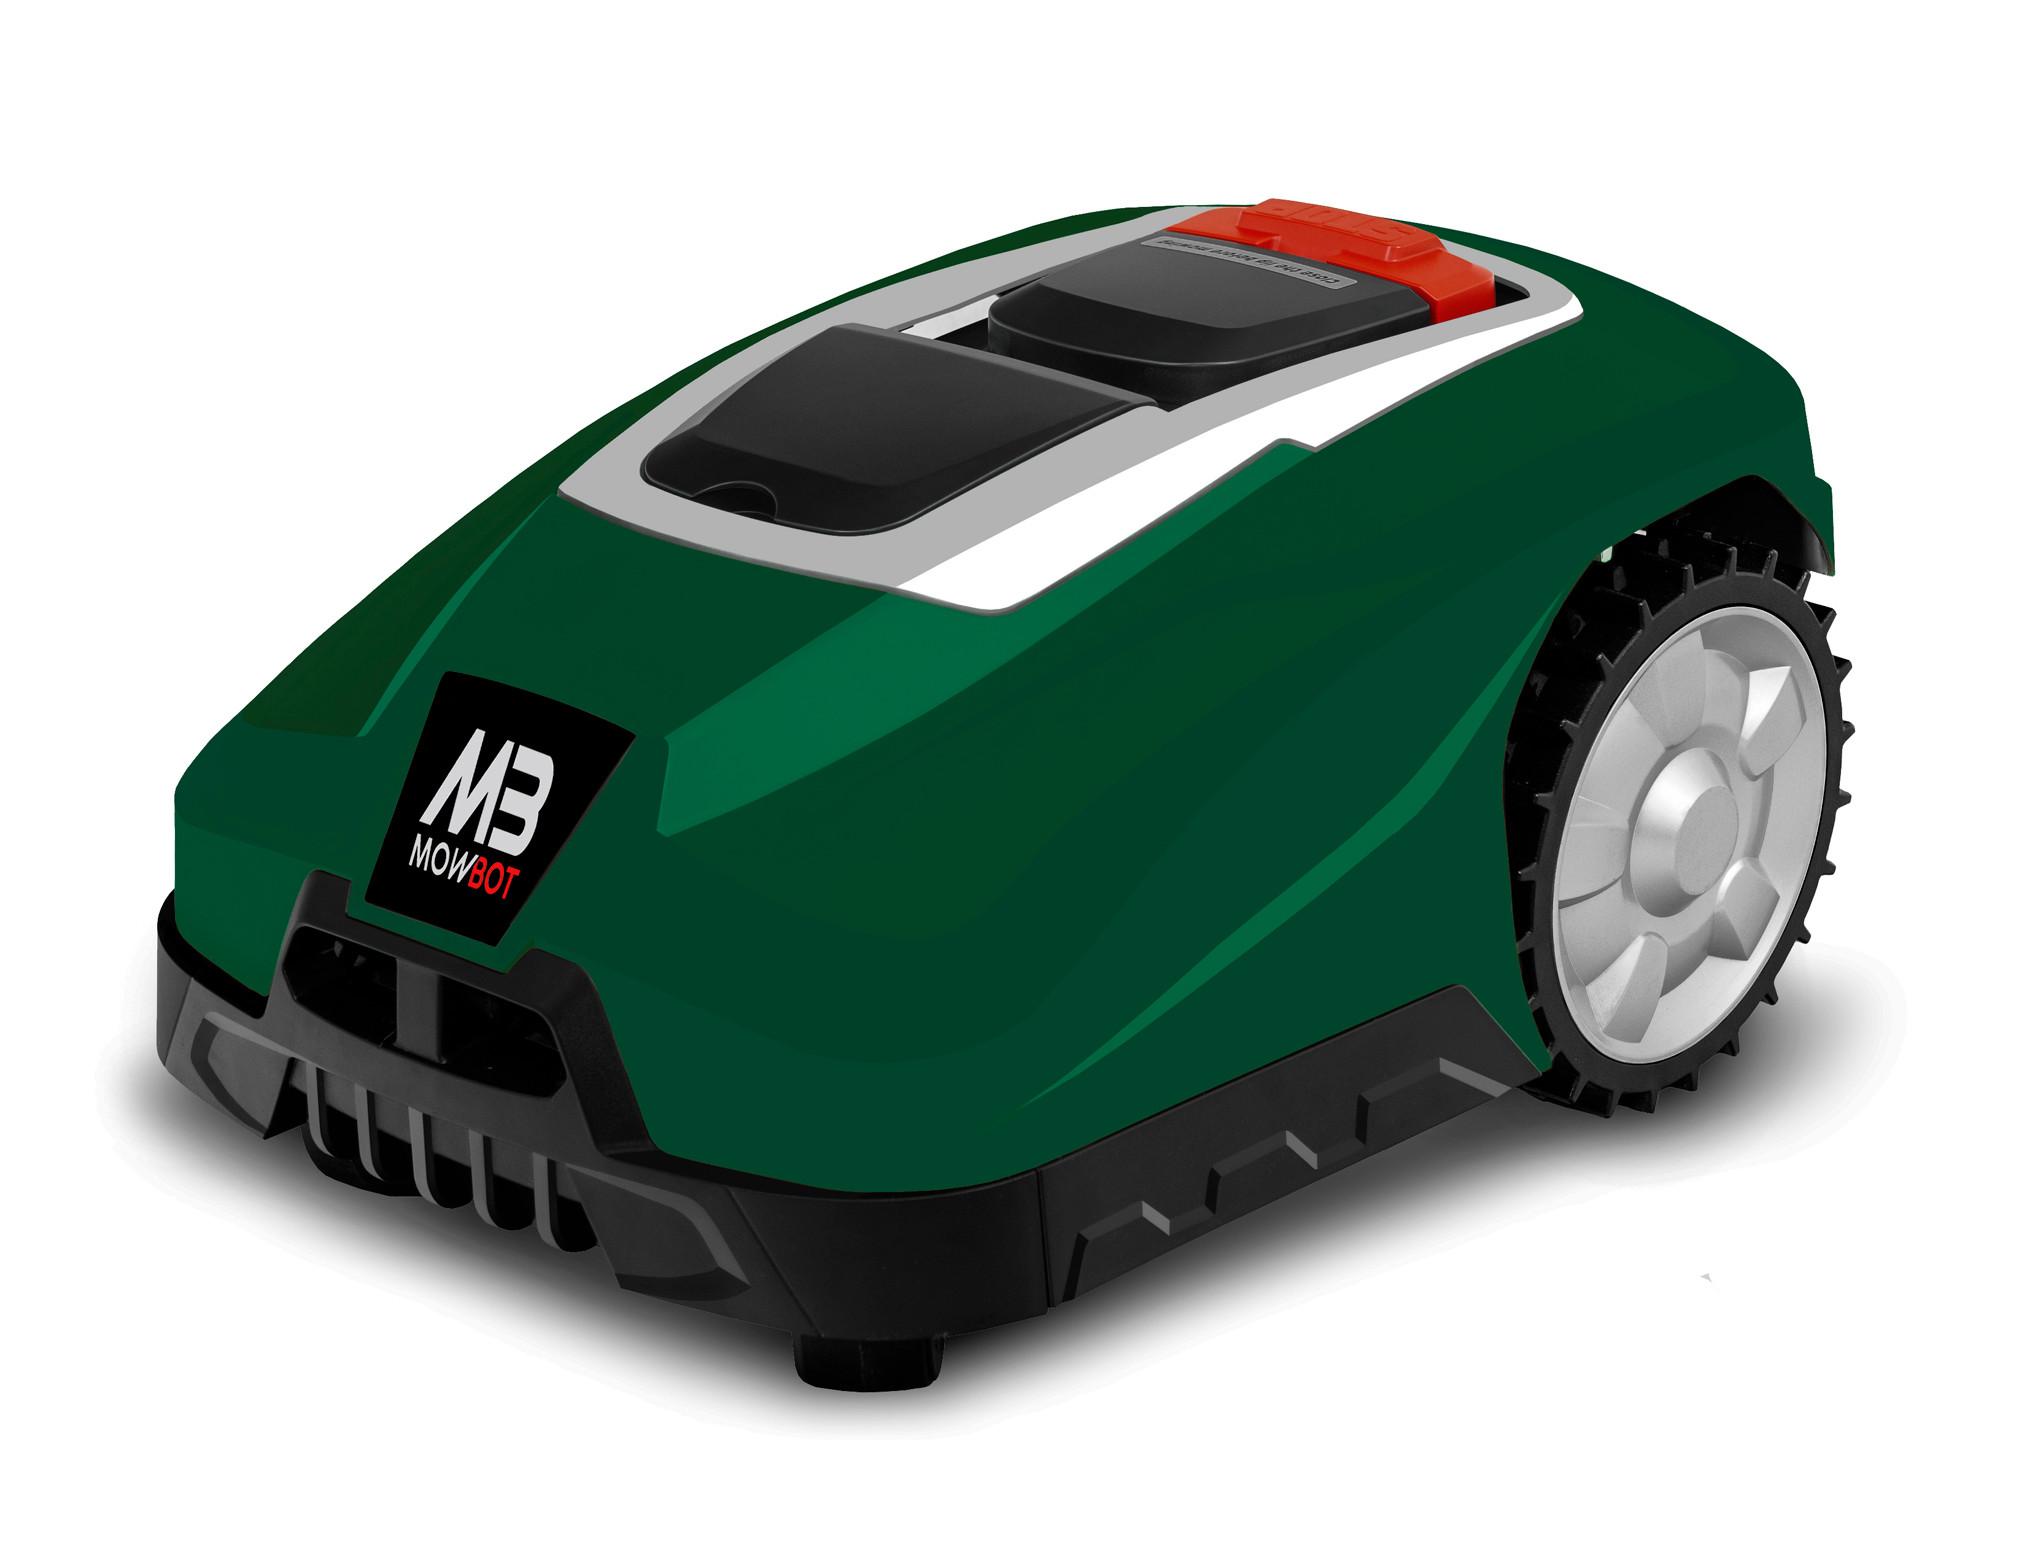 Mowbot 1200 Solid Green 1200sq/m Robotic Mower